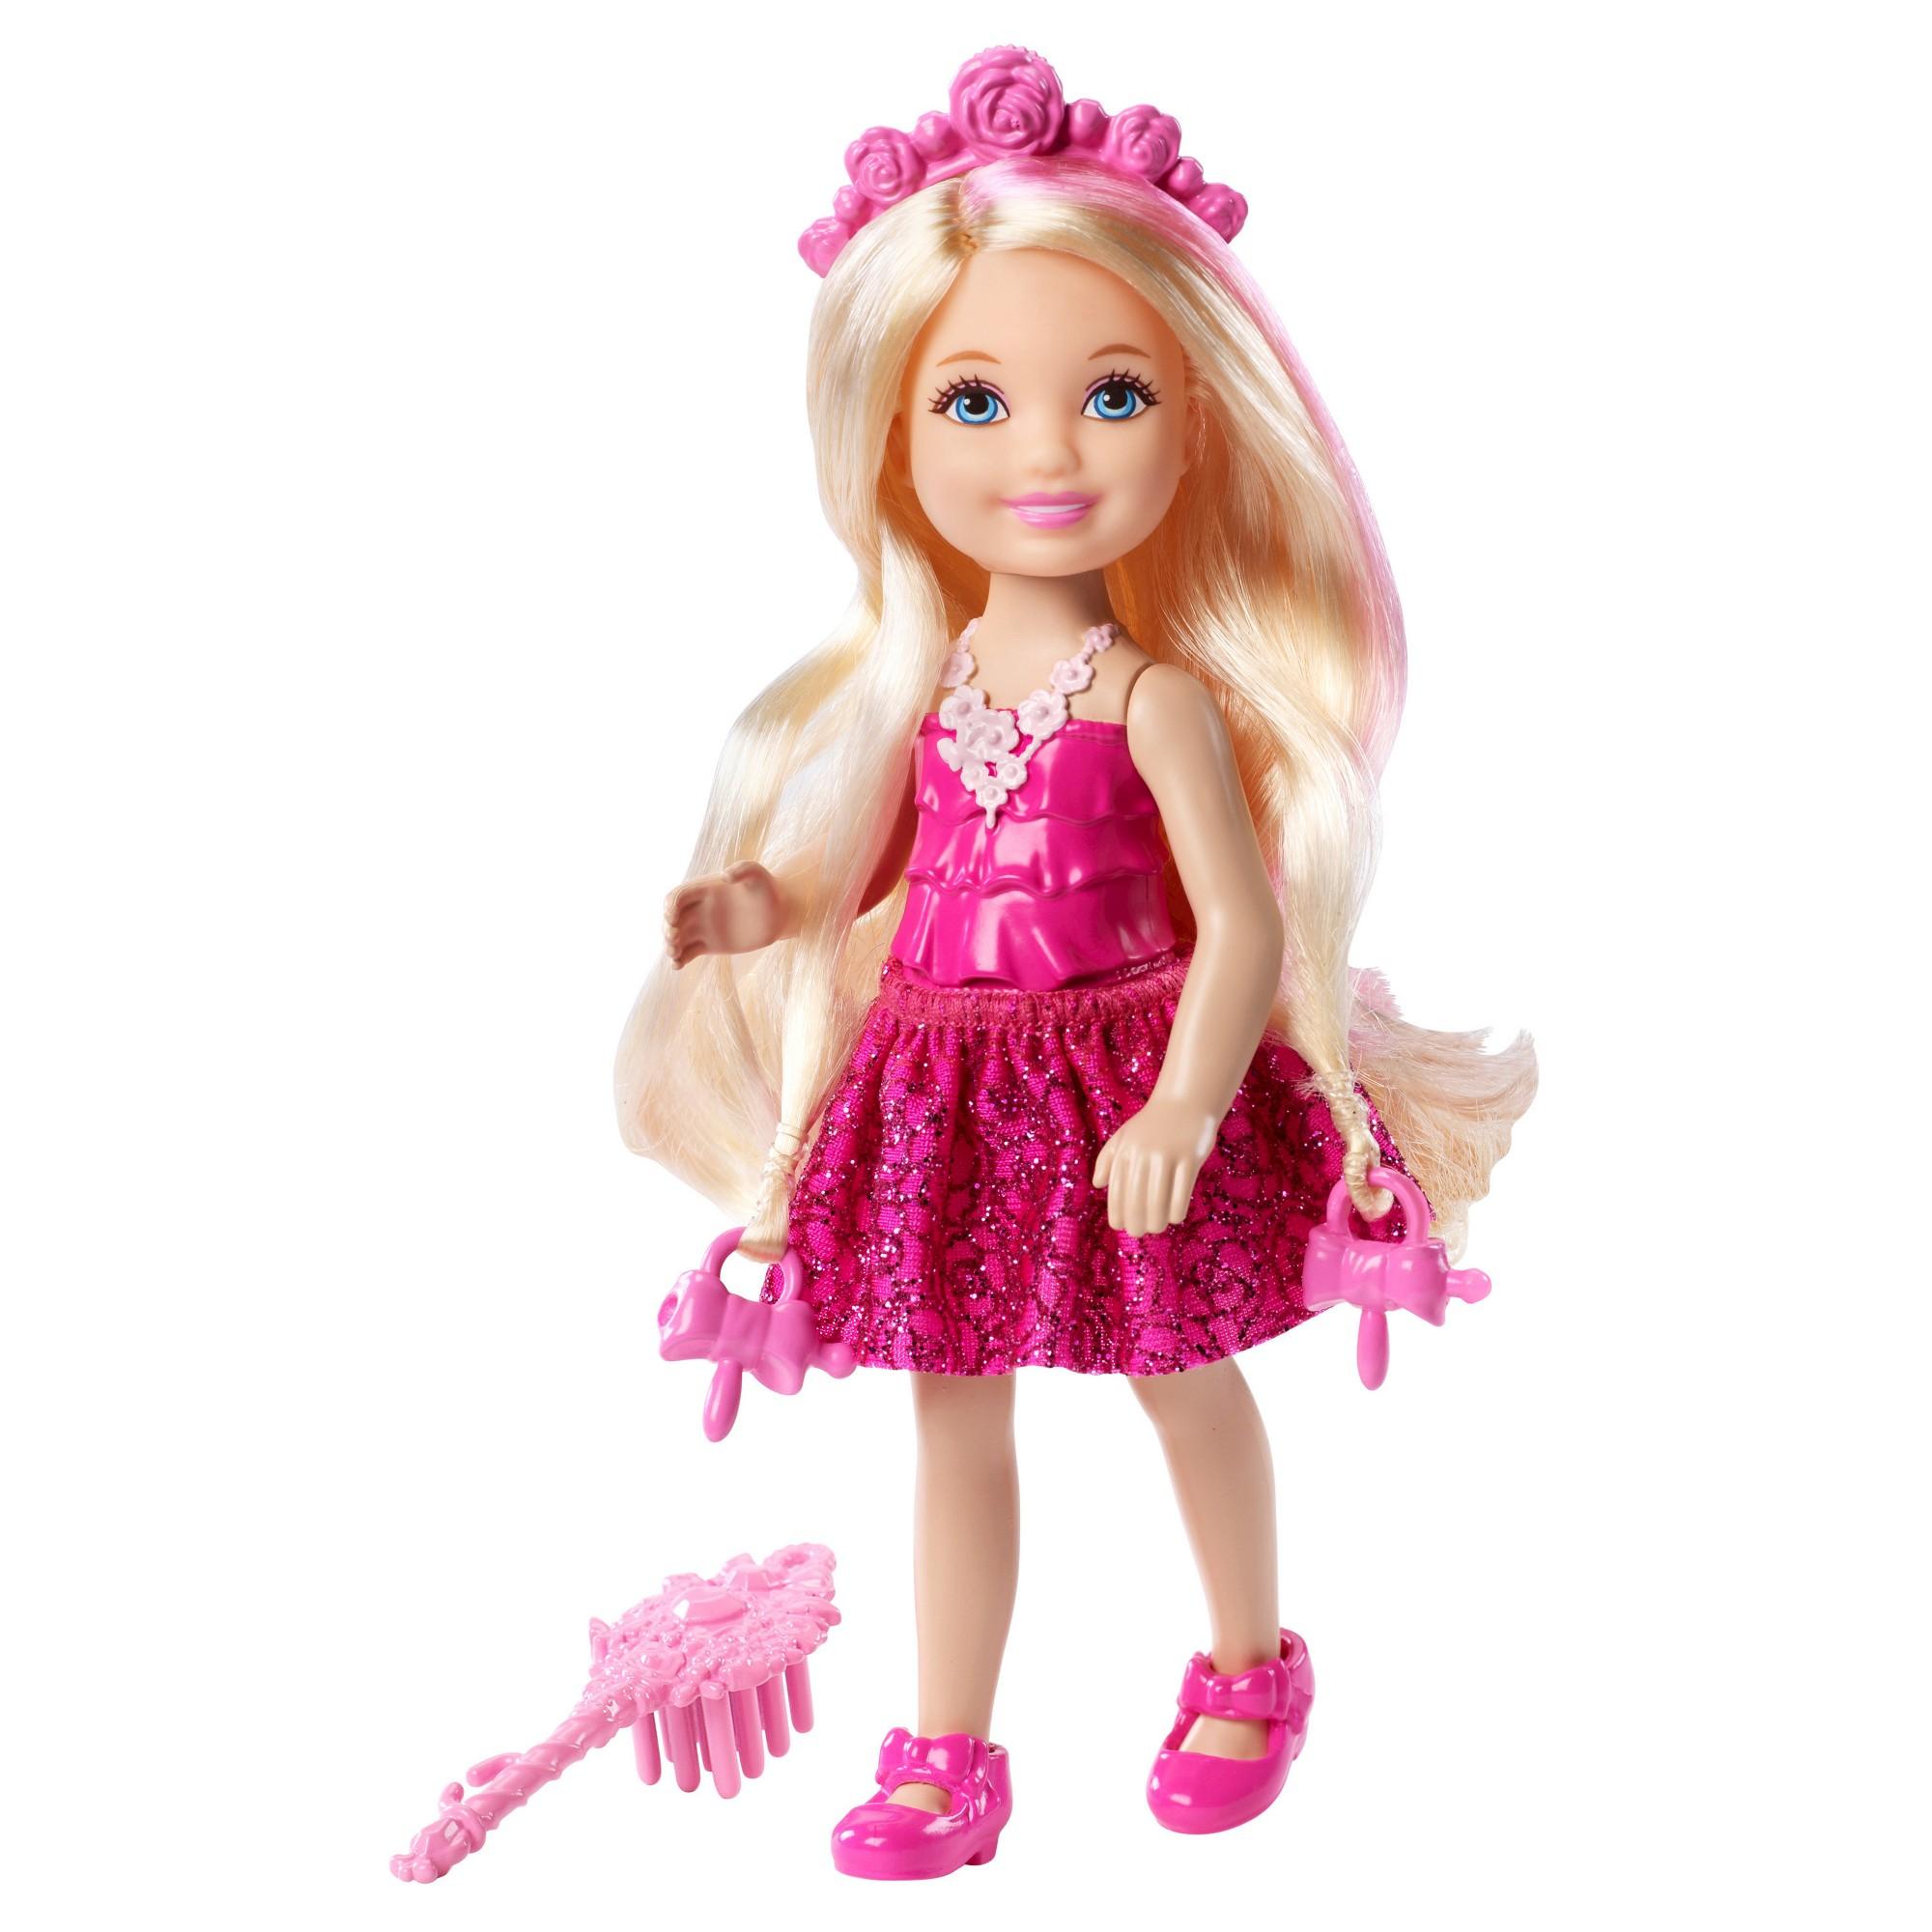 Barbie Endless Hair Kingdom Princess Doll Pink Free Shipping